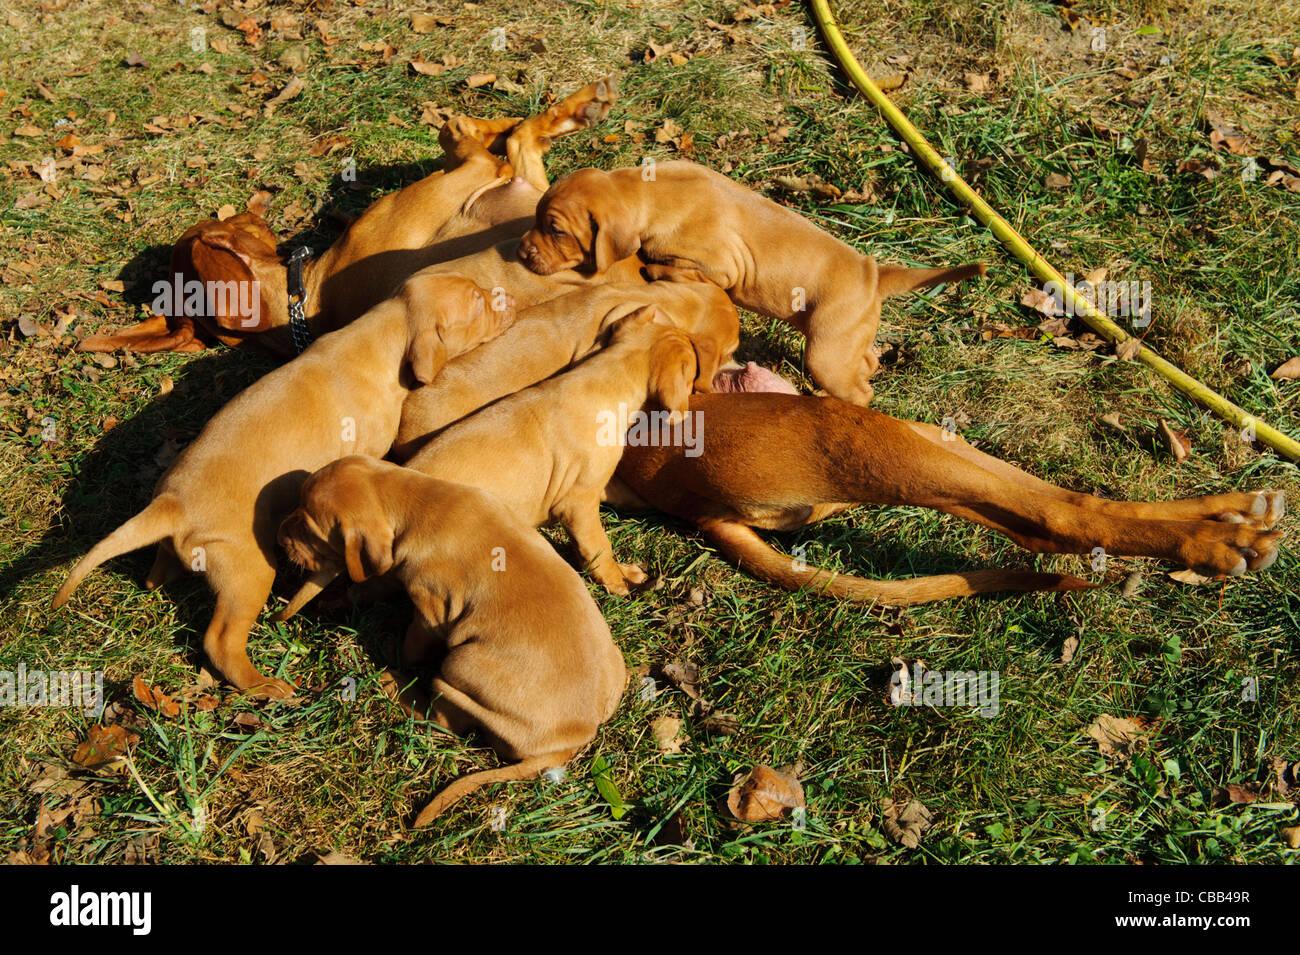 Stock photo of hungarian vizsla pups feeding of their mother - Stock Image